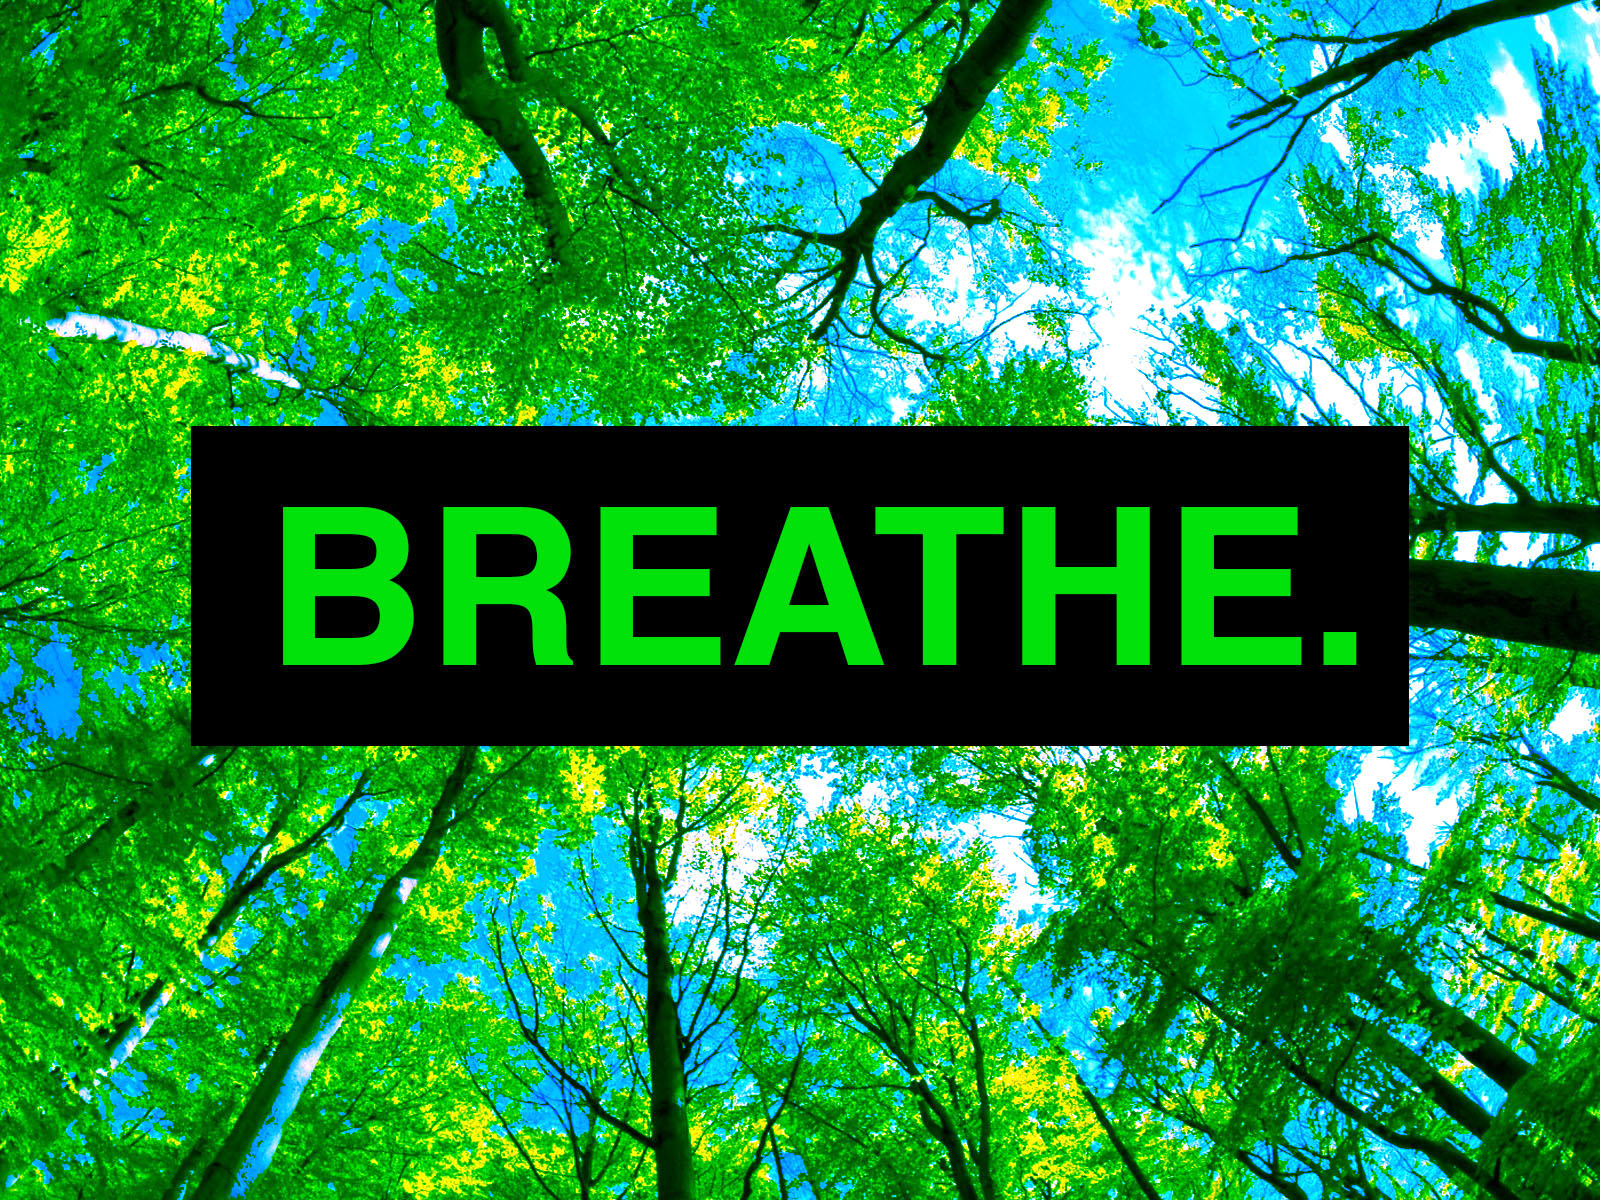 Breathe poster copy.jpg